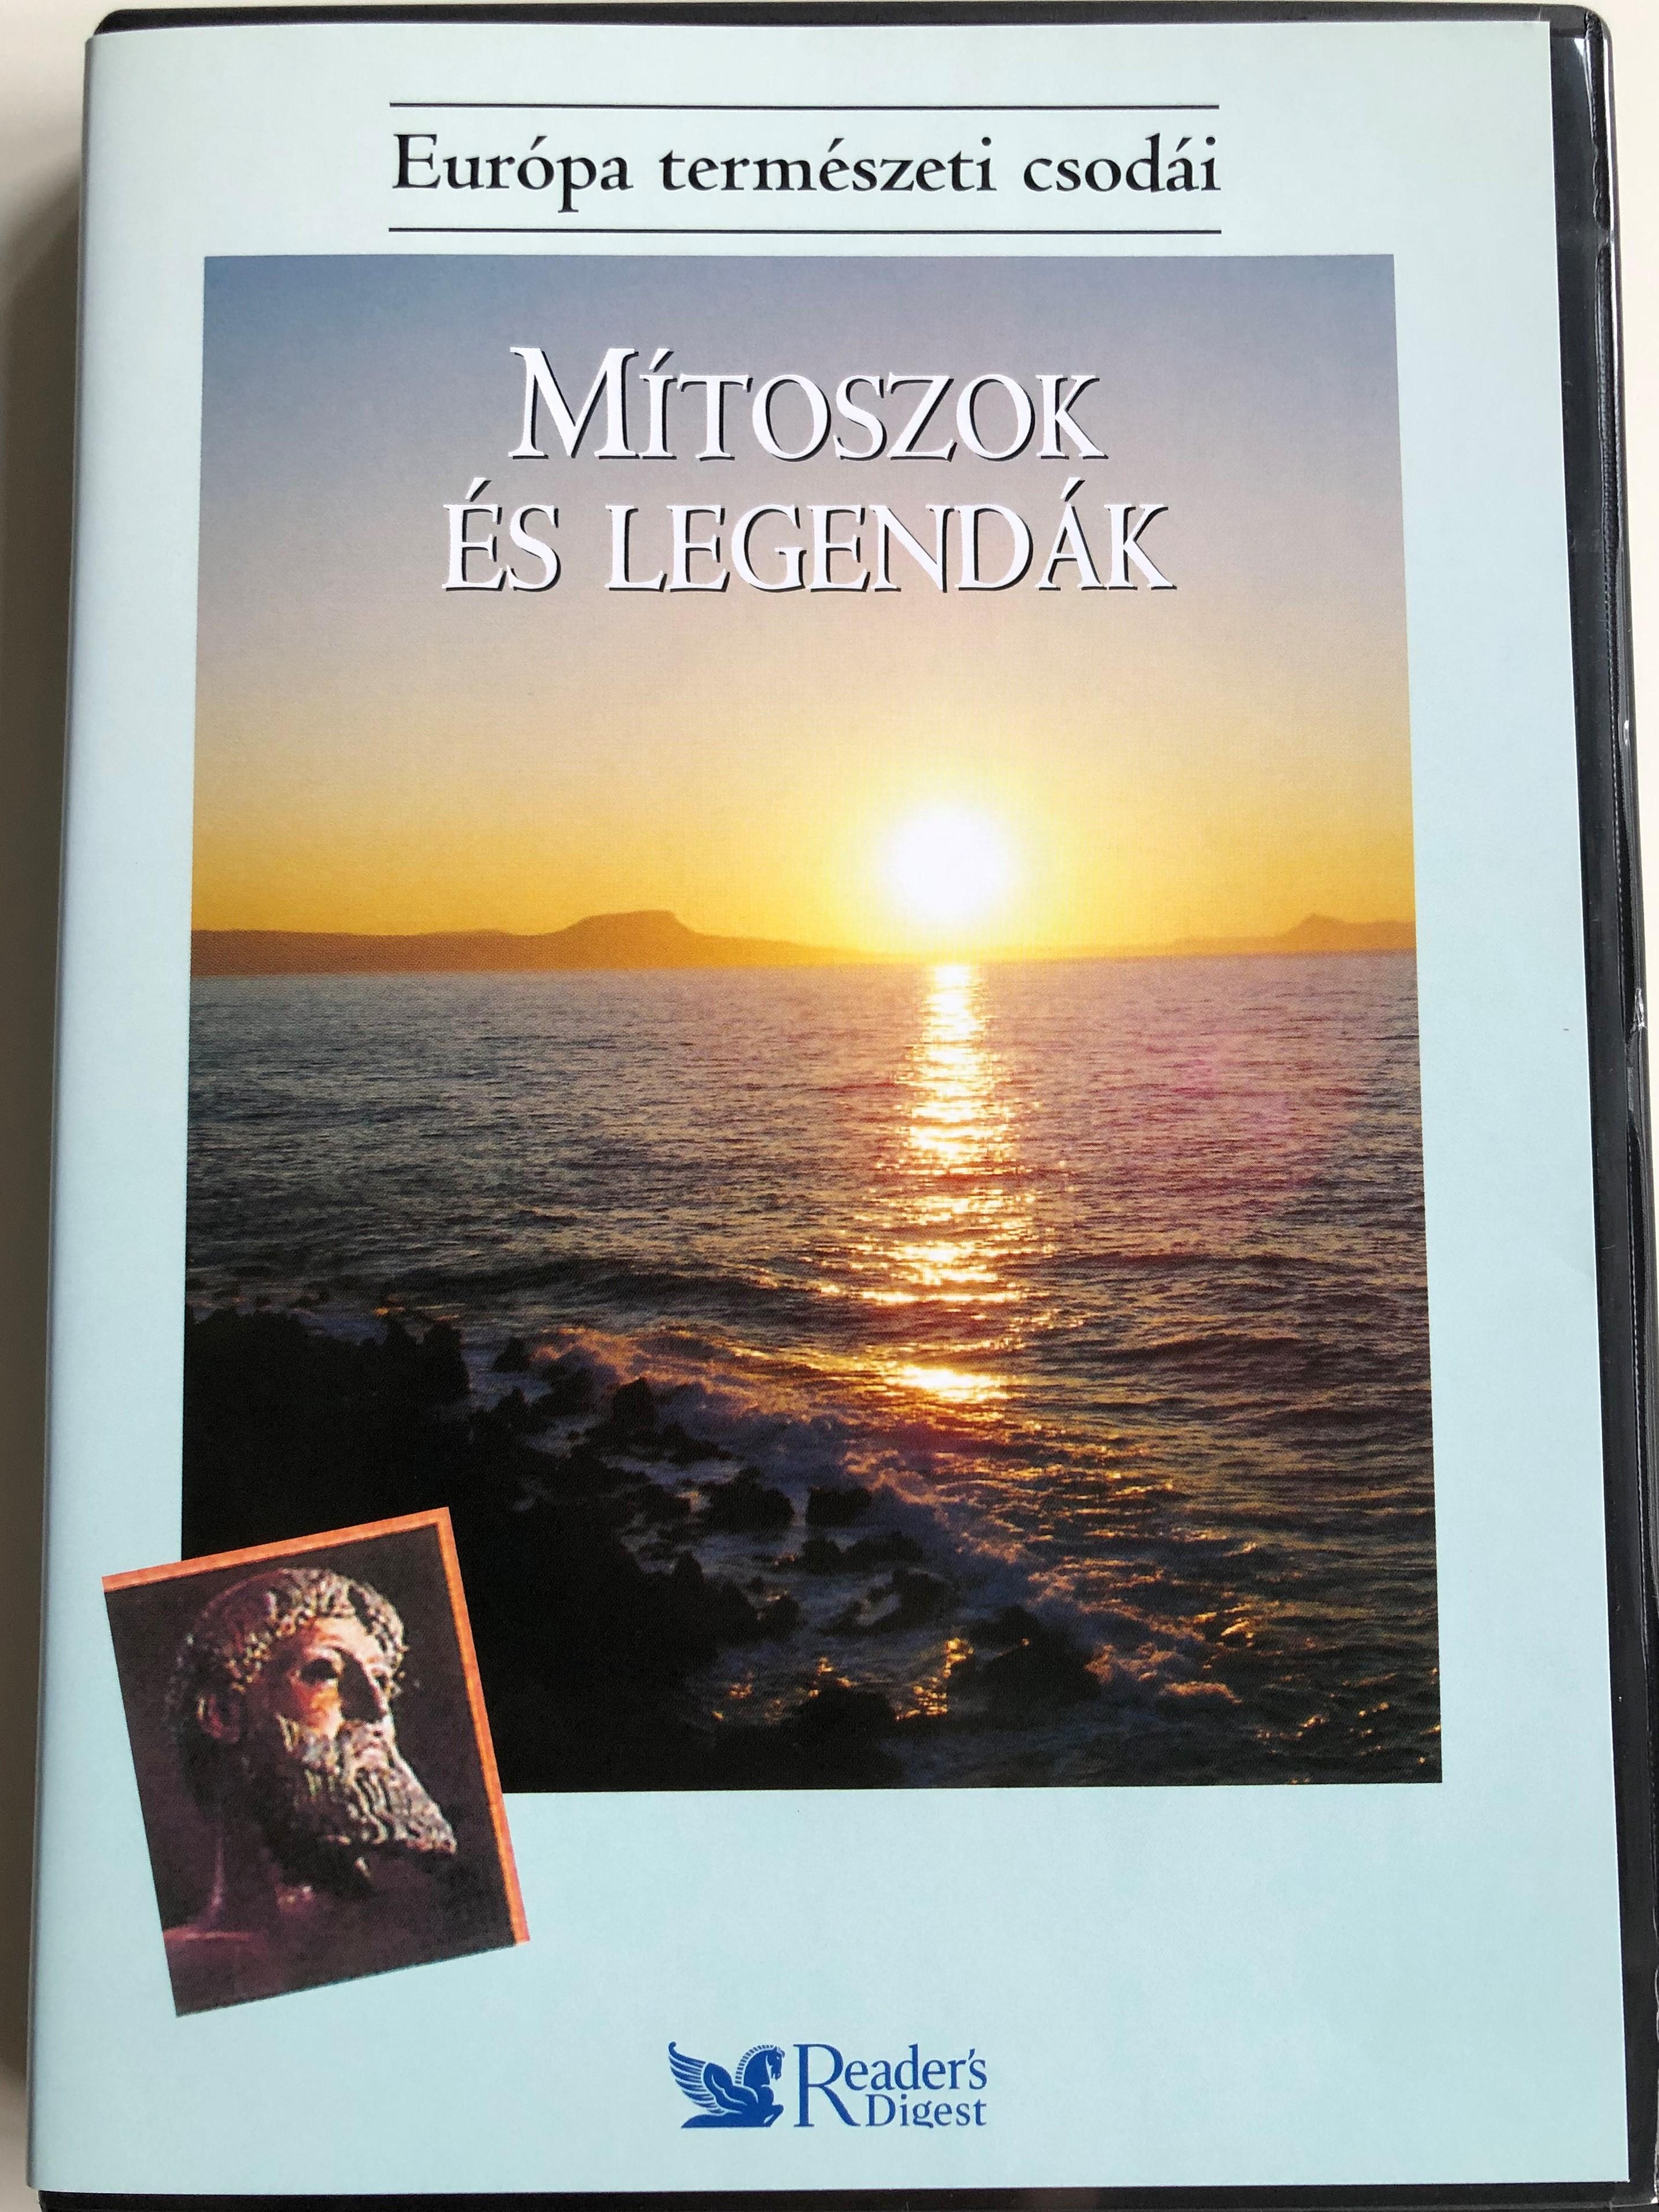 m-toszok-s-legend-k-eur-pa-term-szeti-csod-i-dvd-2005-reader-s-digest-1.jpg